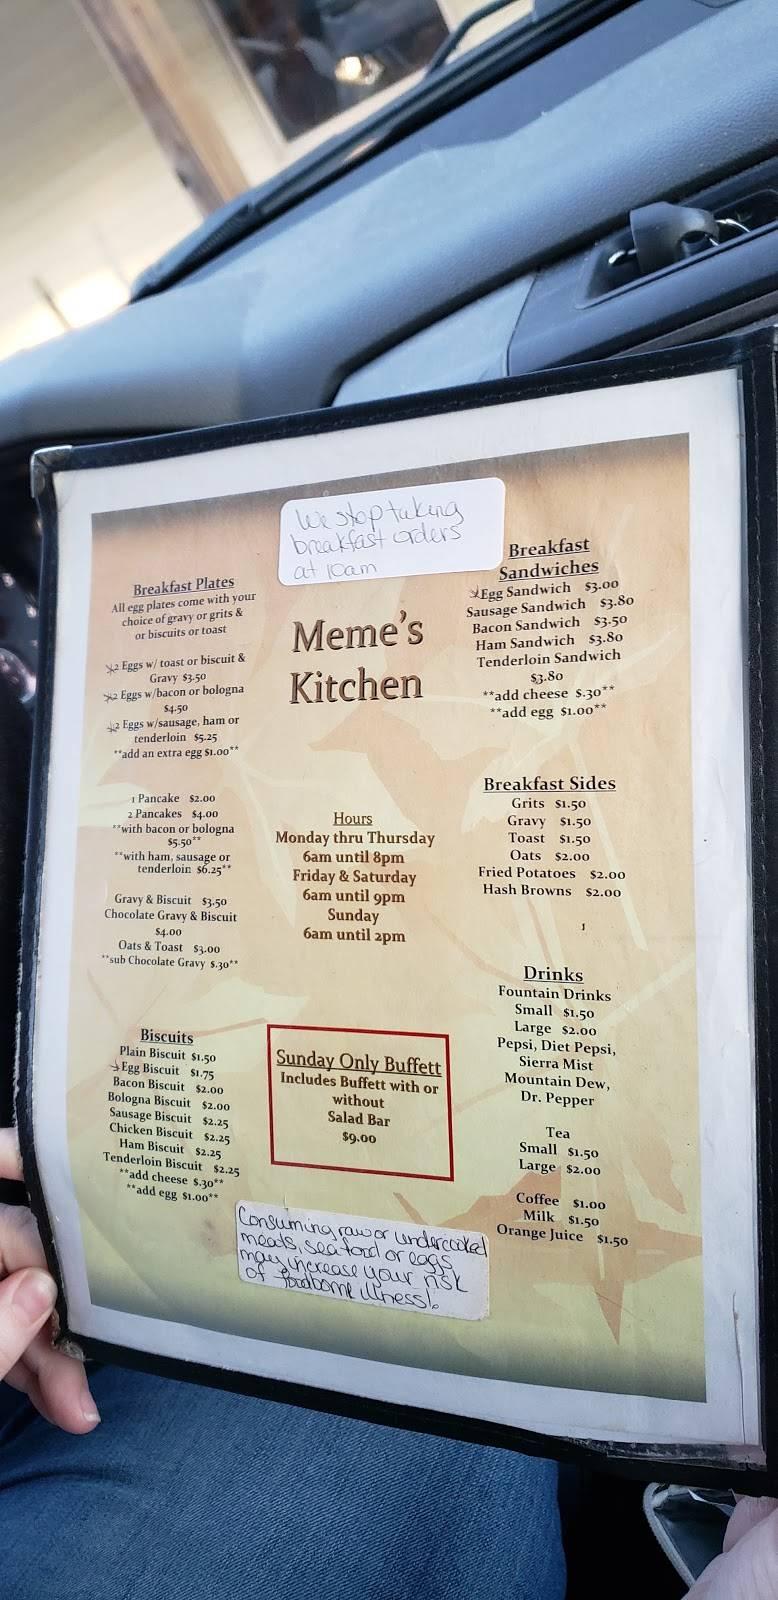 Meme S Kitchen Restaurant 927 Tn 13 Collinwood Tn 38450 Usa